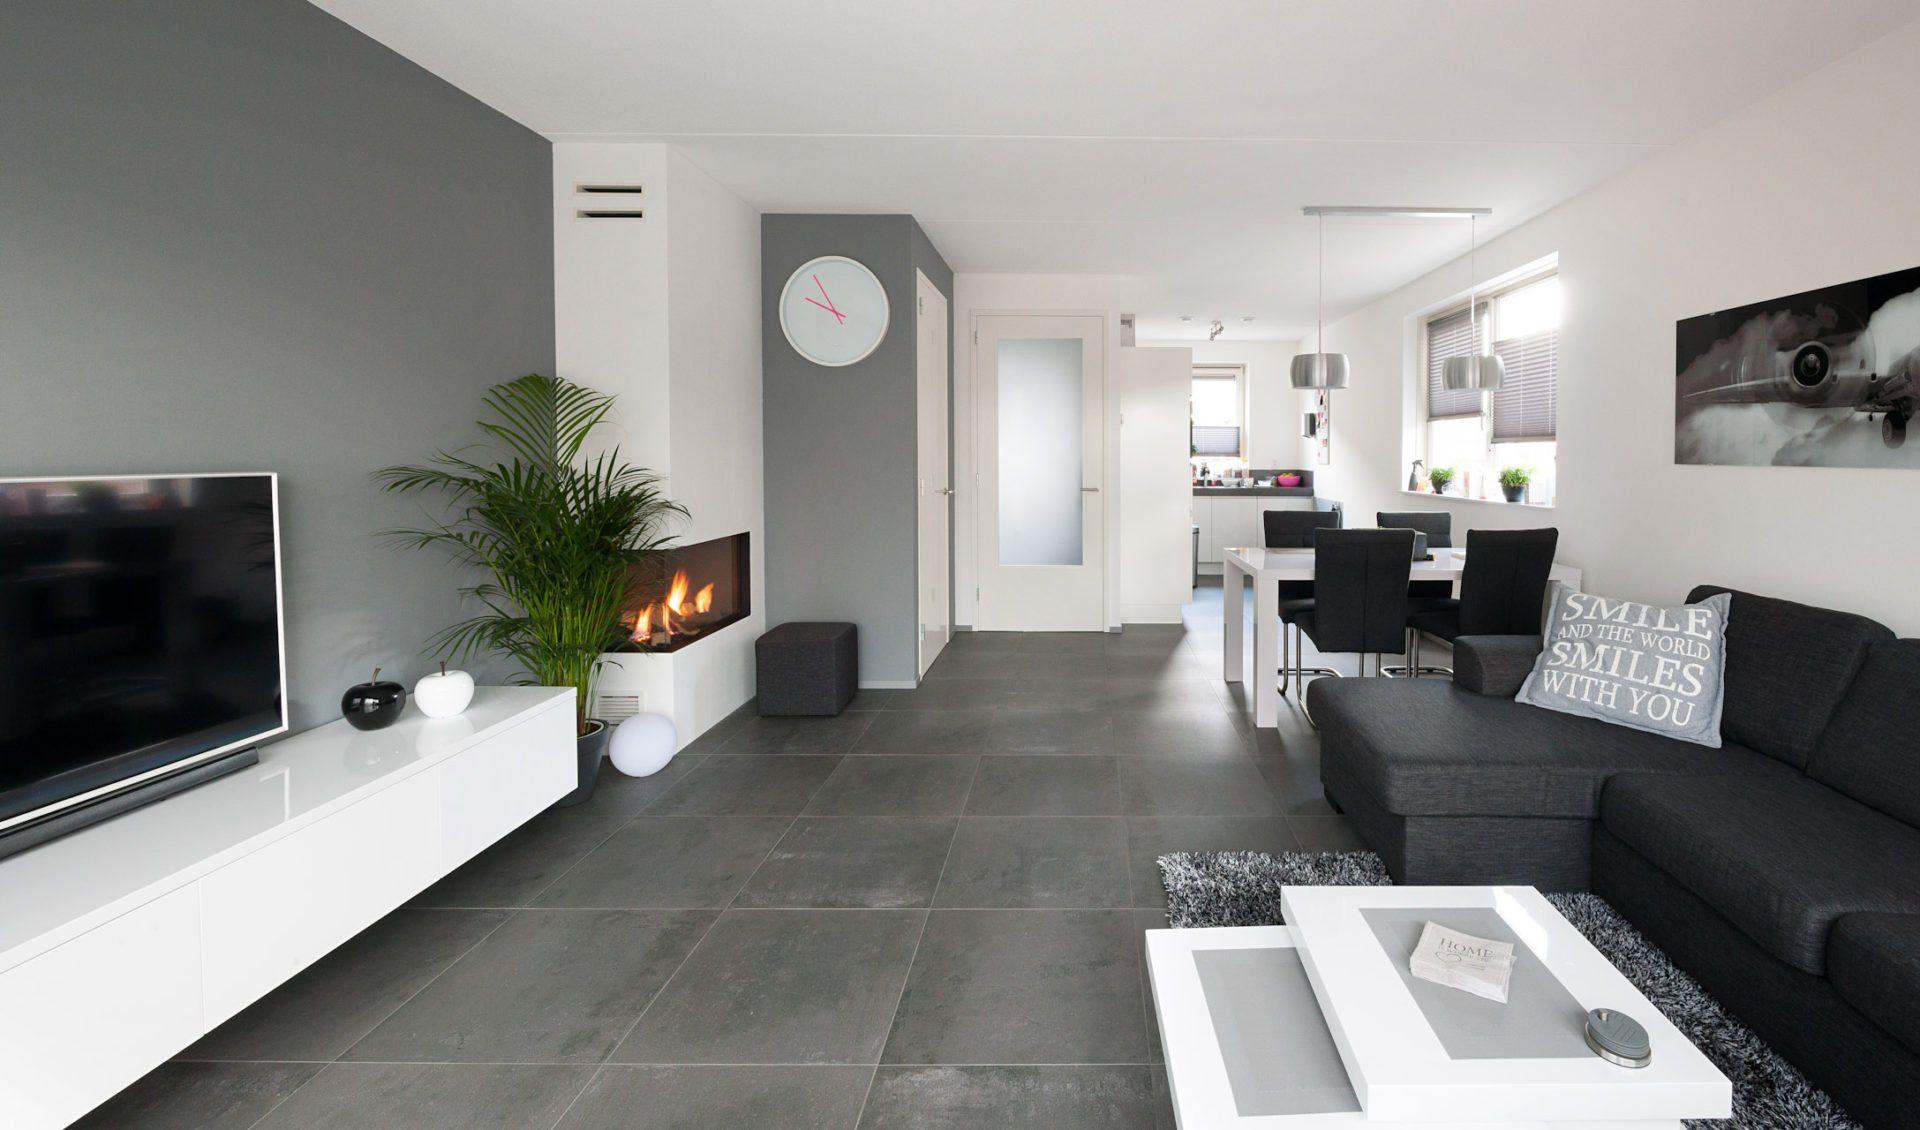 Stunning Mooie Tegels Woonkamer Ideas - New Home Design 2018 ...